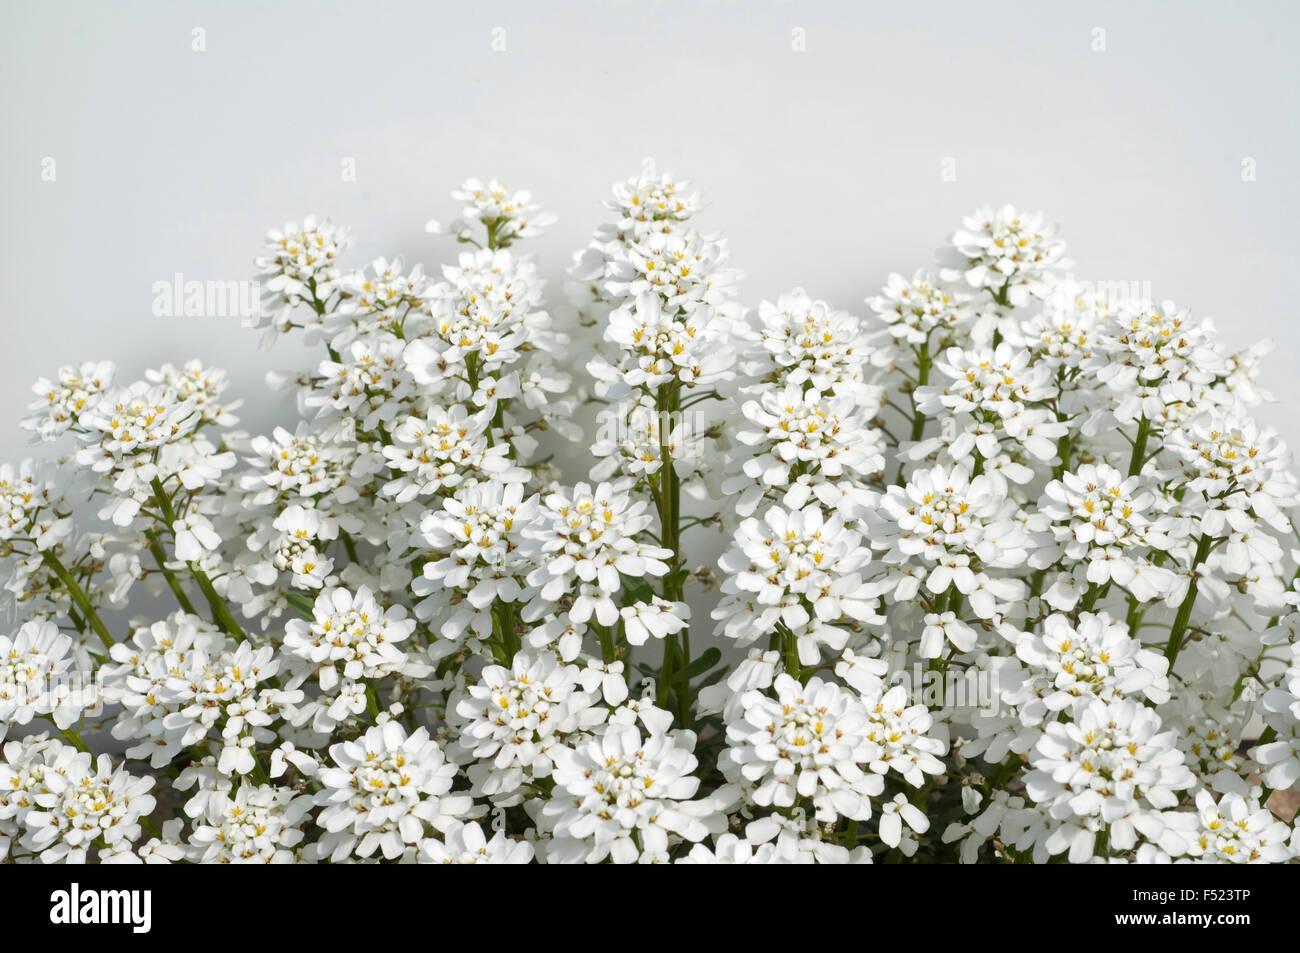 Schleifenblume, Iberis, sempervierens, - Stock Image